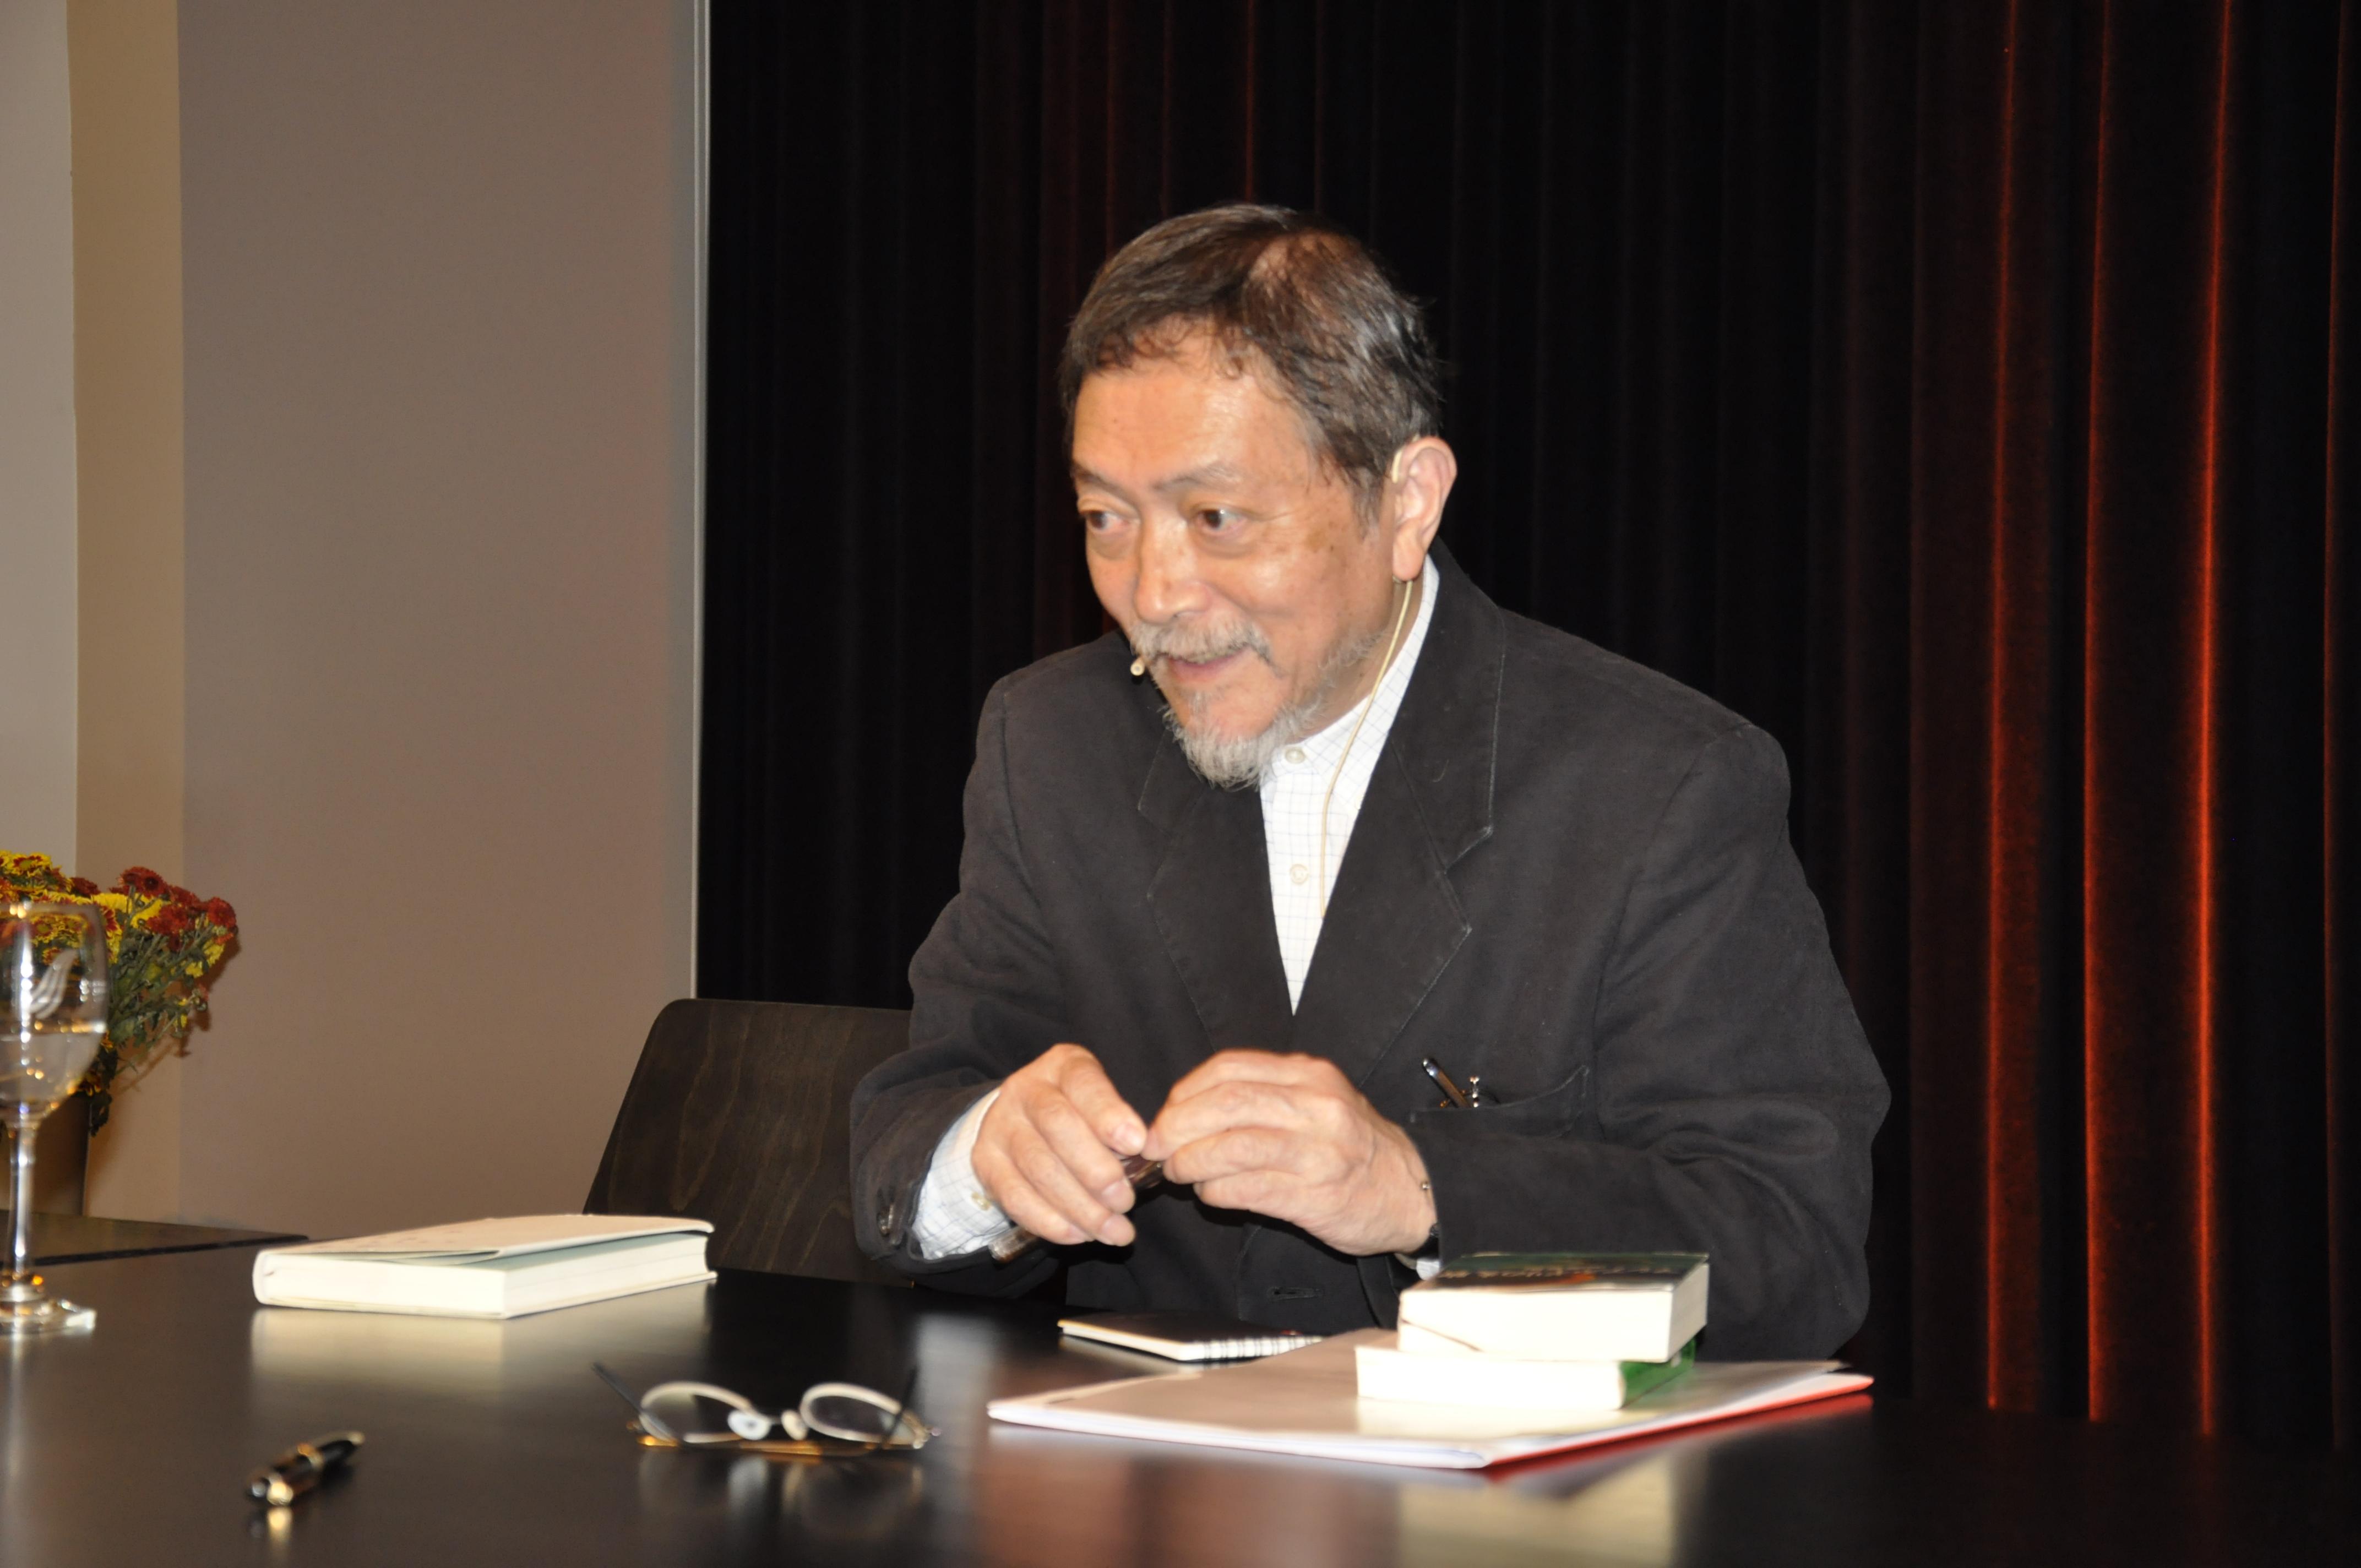 Natsuki Ikezawa beim Signieren am 29.10.2014